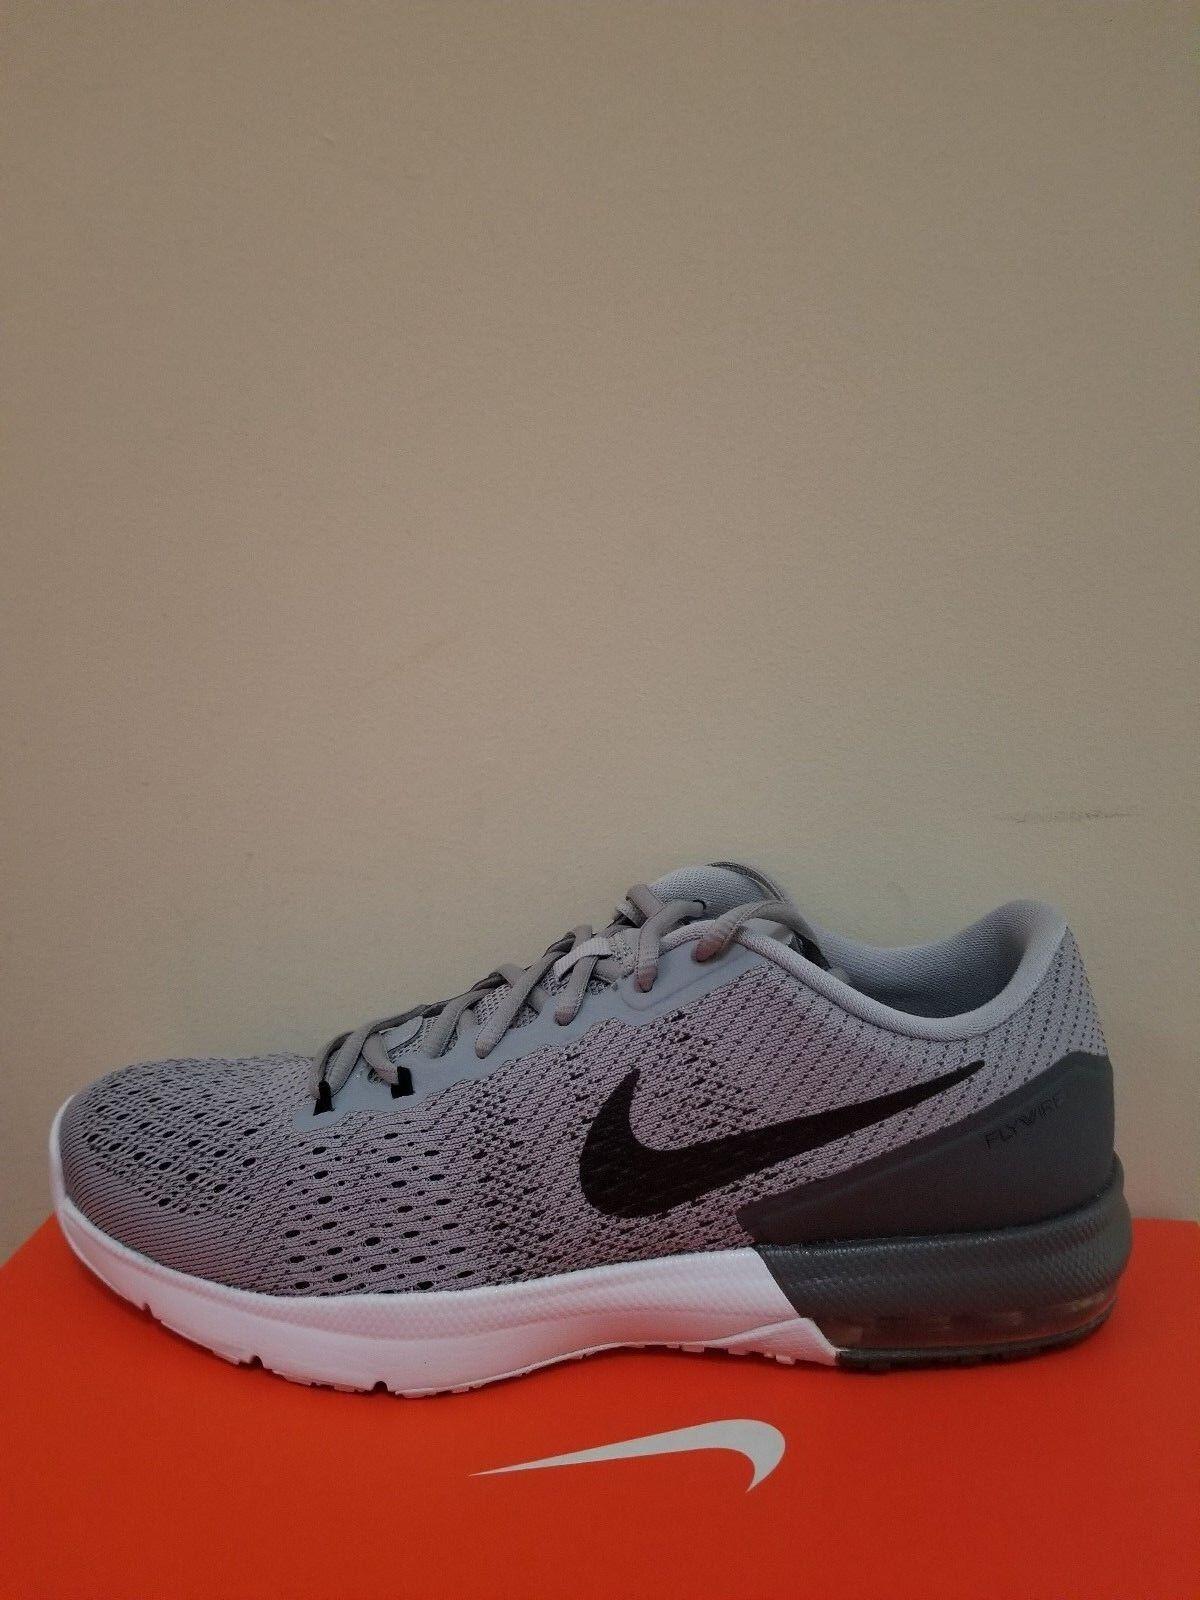 Nike Air Max Typha Running shoes Size 13 NIB